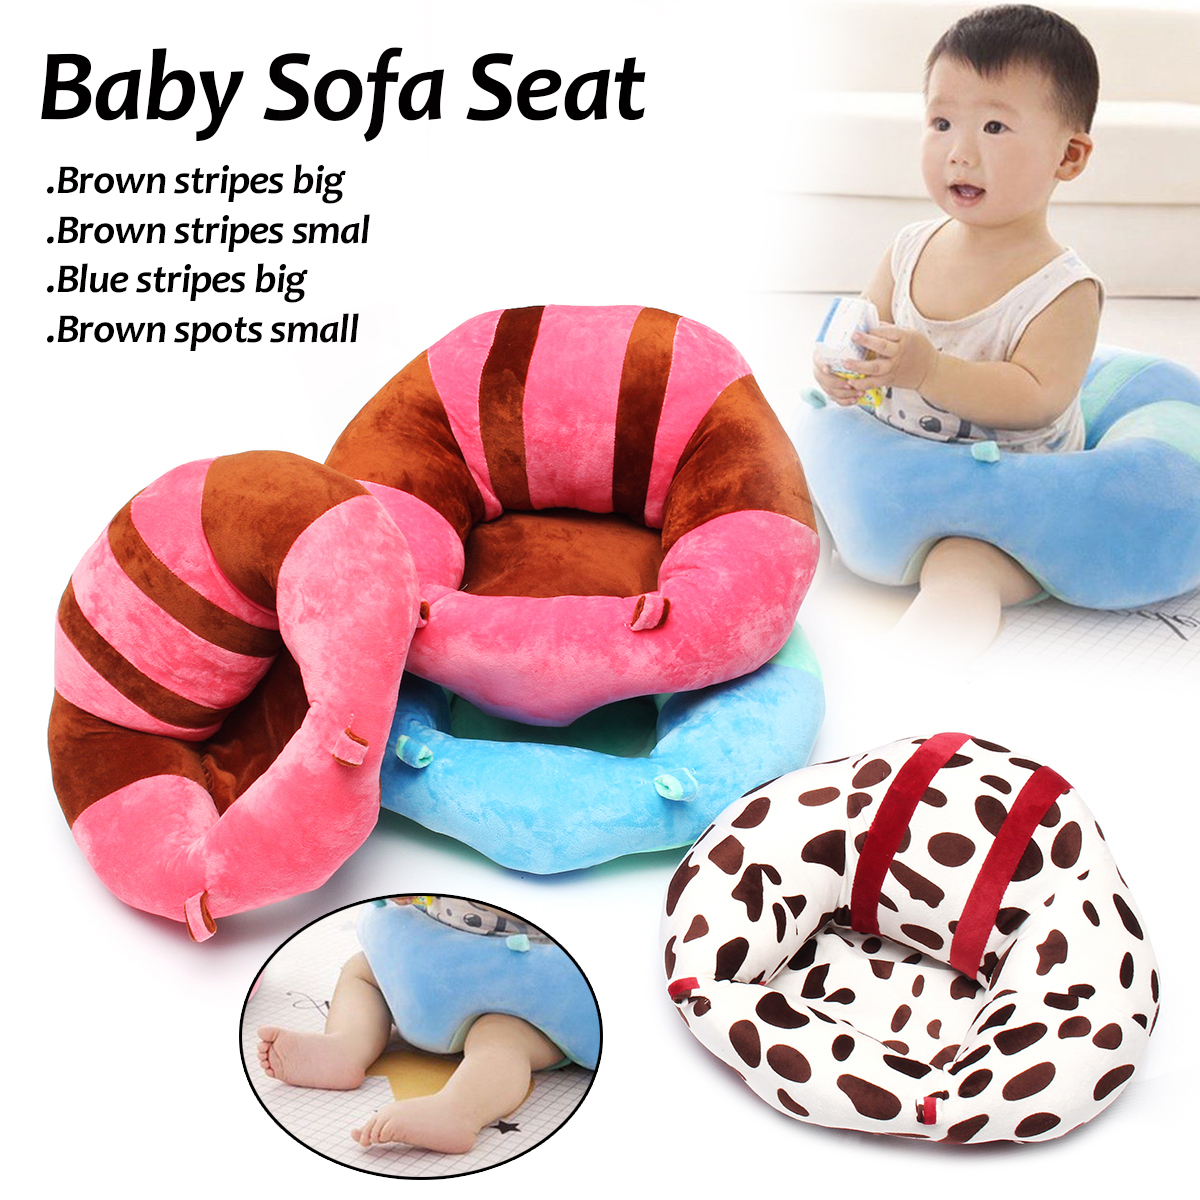 baby sofa support seat nursing pillow